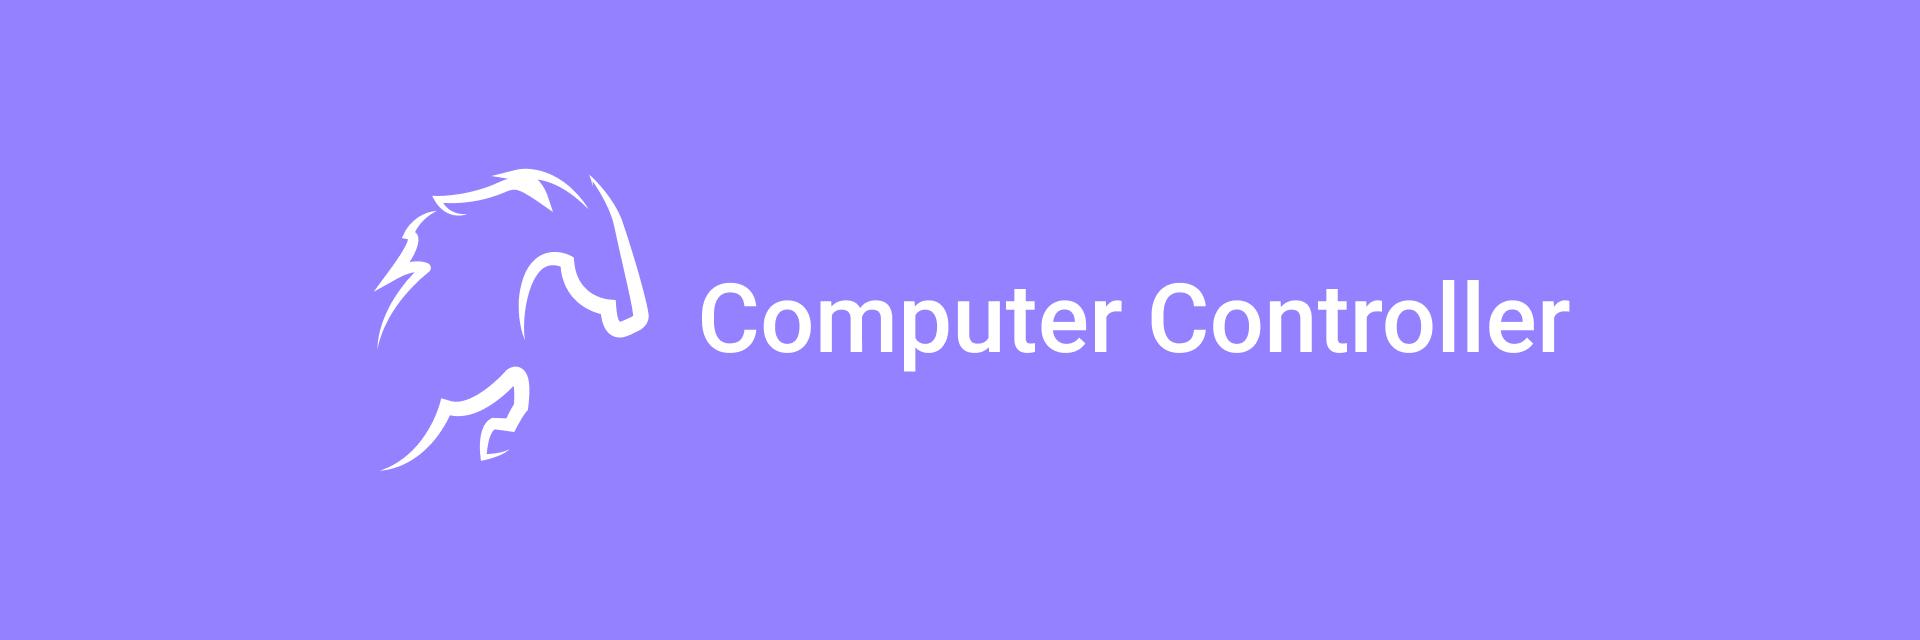 Computer Controller banner